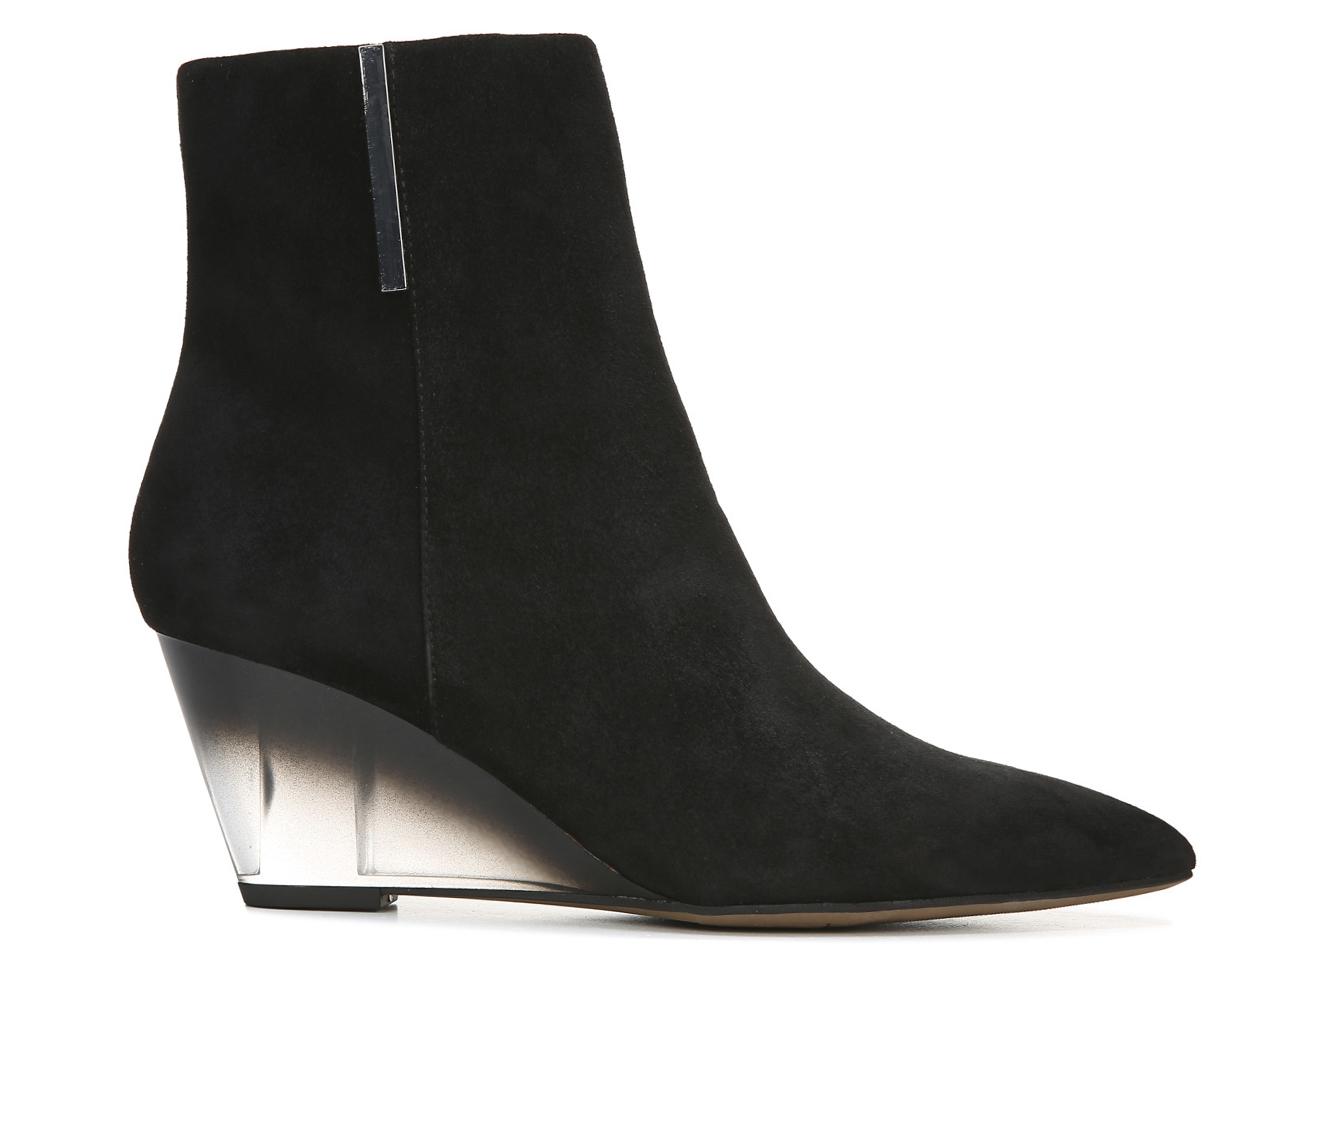 Franco Sarto Athens Women's Boot (Black Suede)